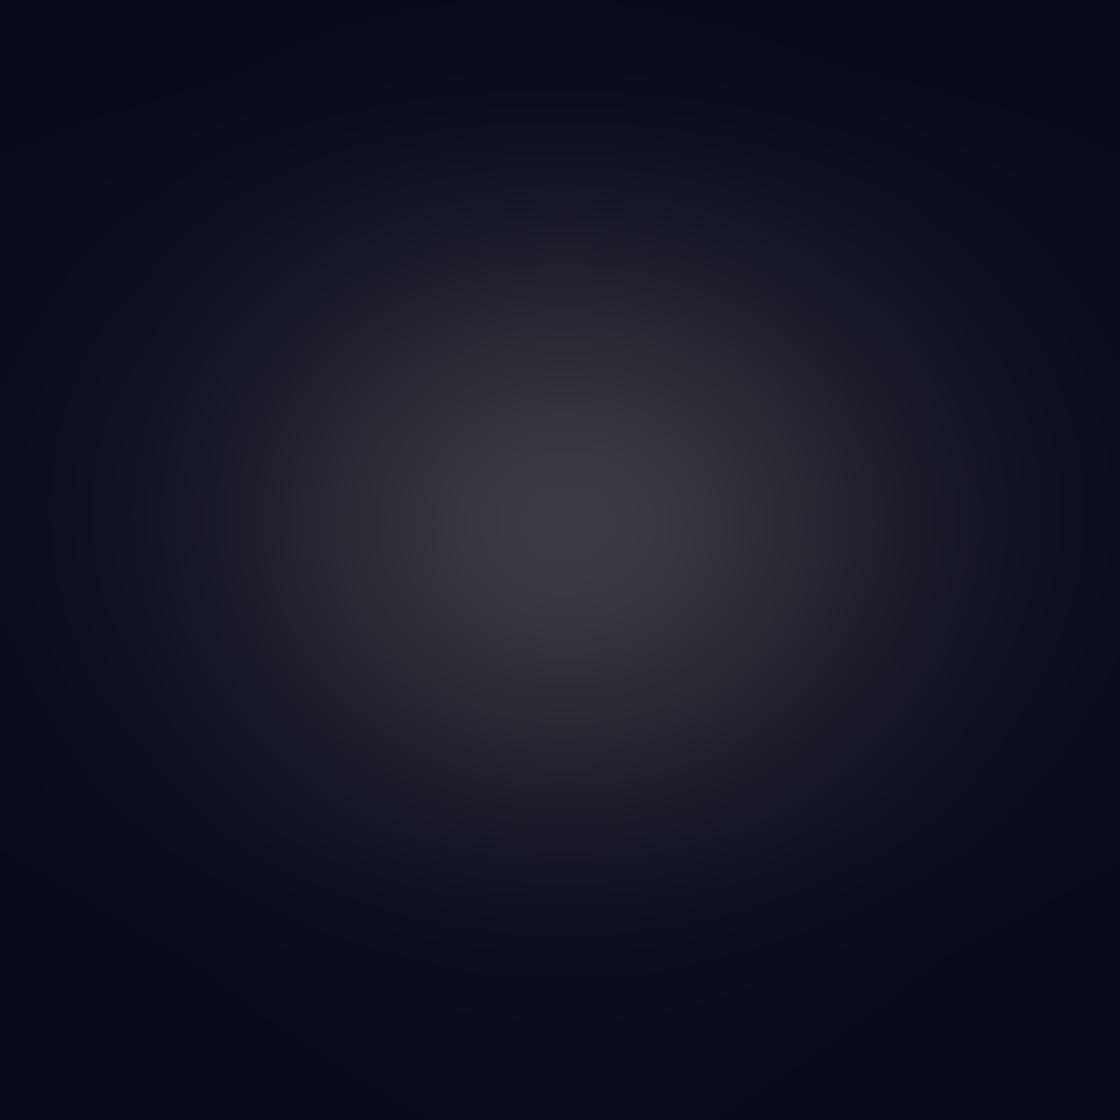 iPhone Photos Black White 27